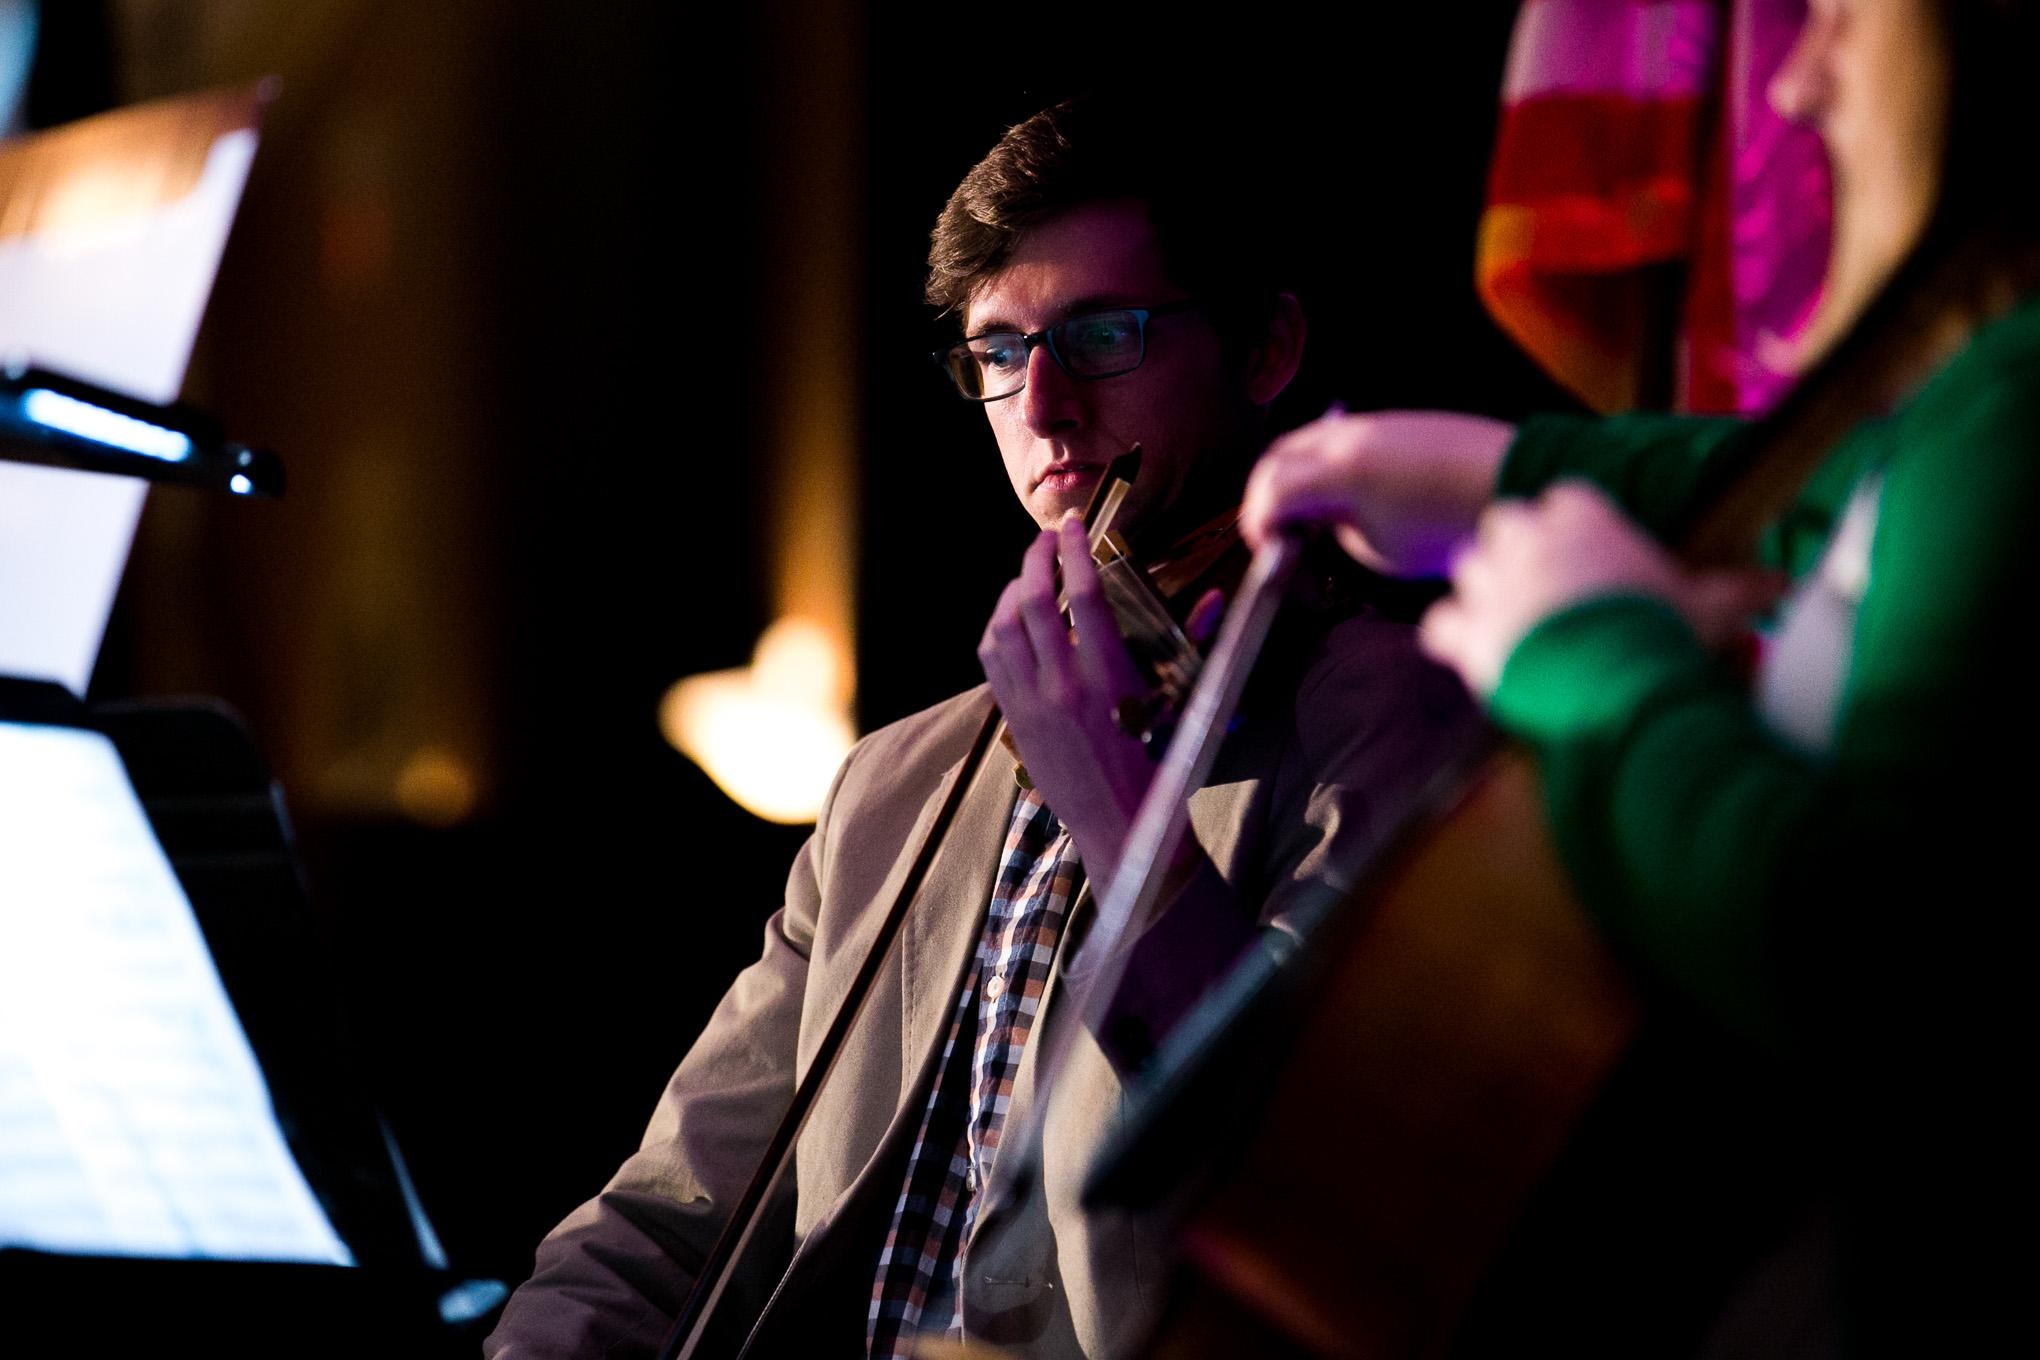 San Antonio Symphony Concertmaster Eric Gratz performs with the San Antonio Symphony String Quartet. Photo by Kathryn Boyd-Batstone